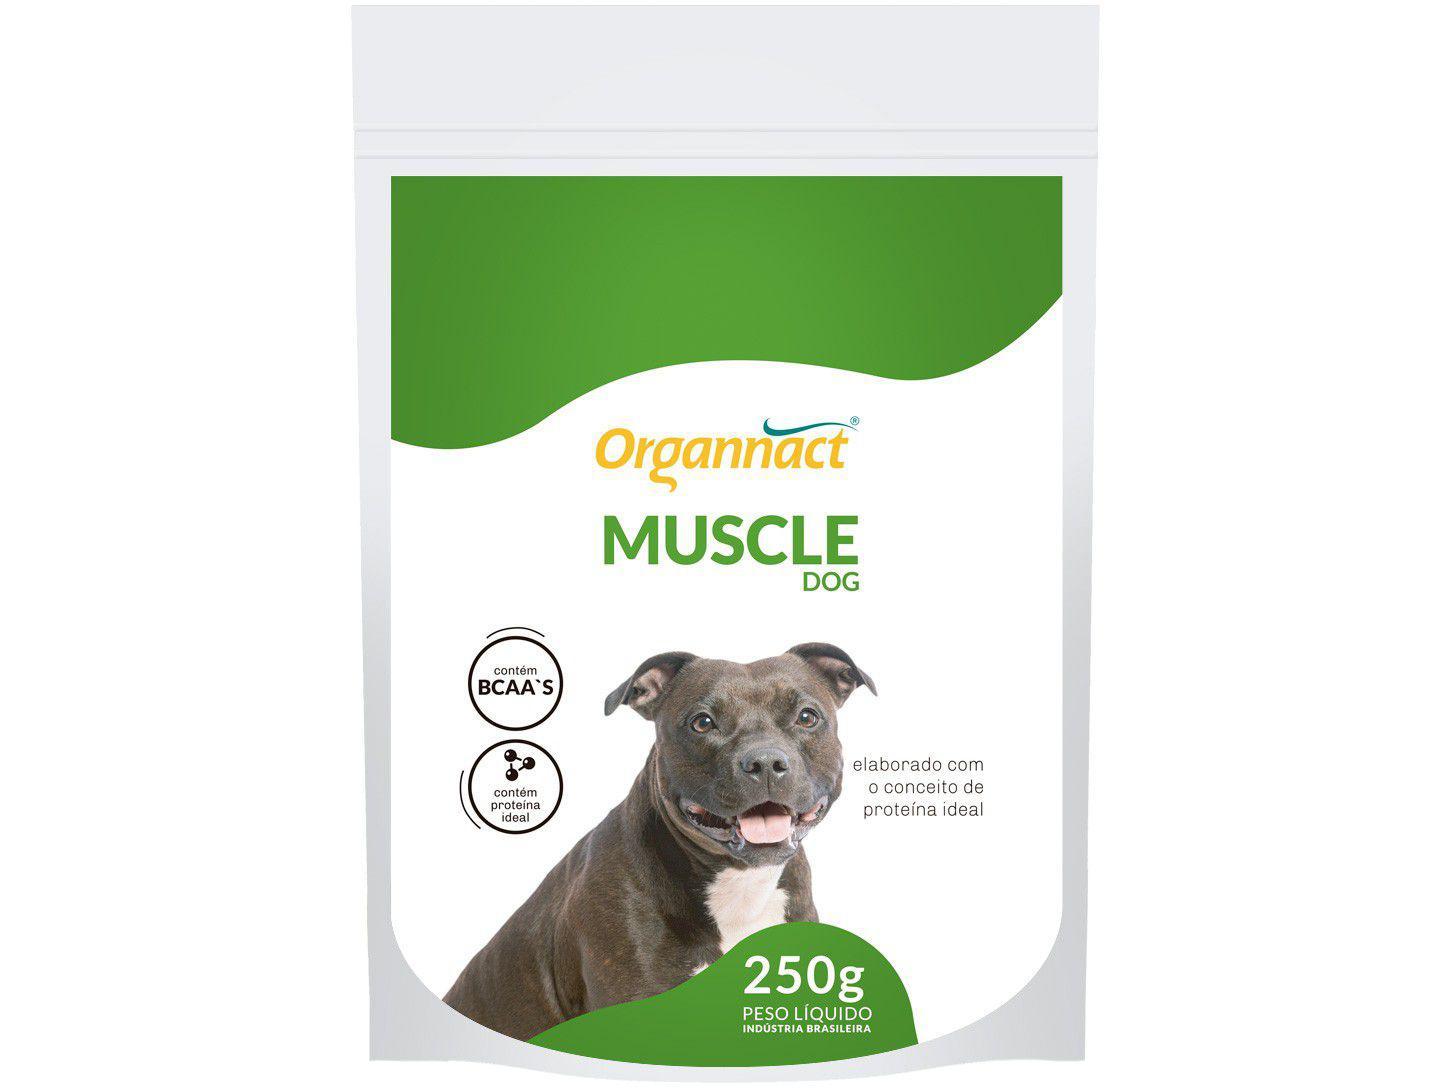 Suplemento Organnact Muscle Dog - para Cachorro 250g